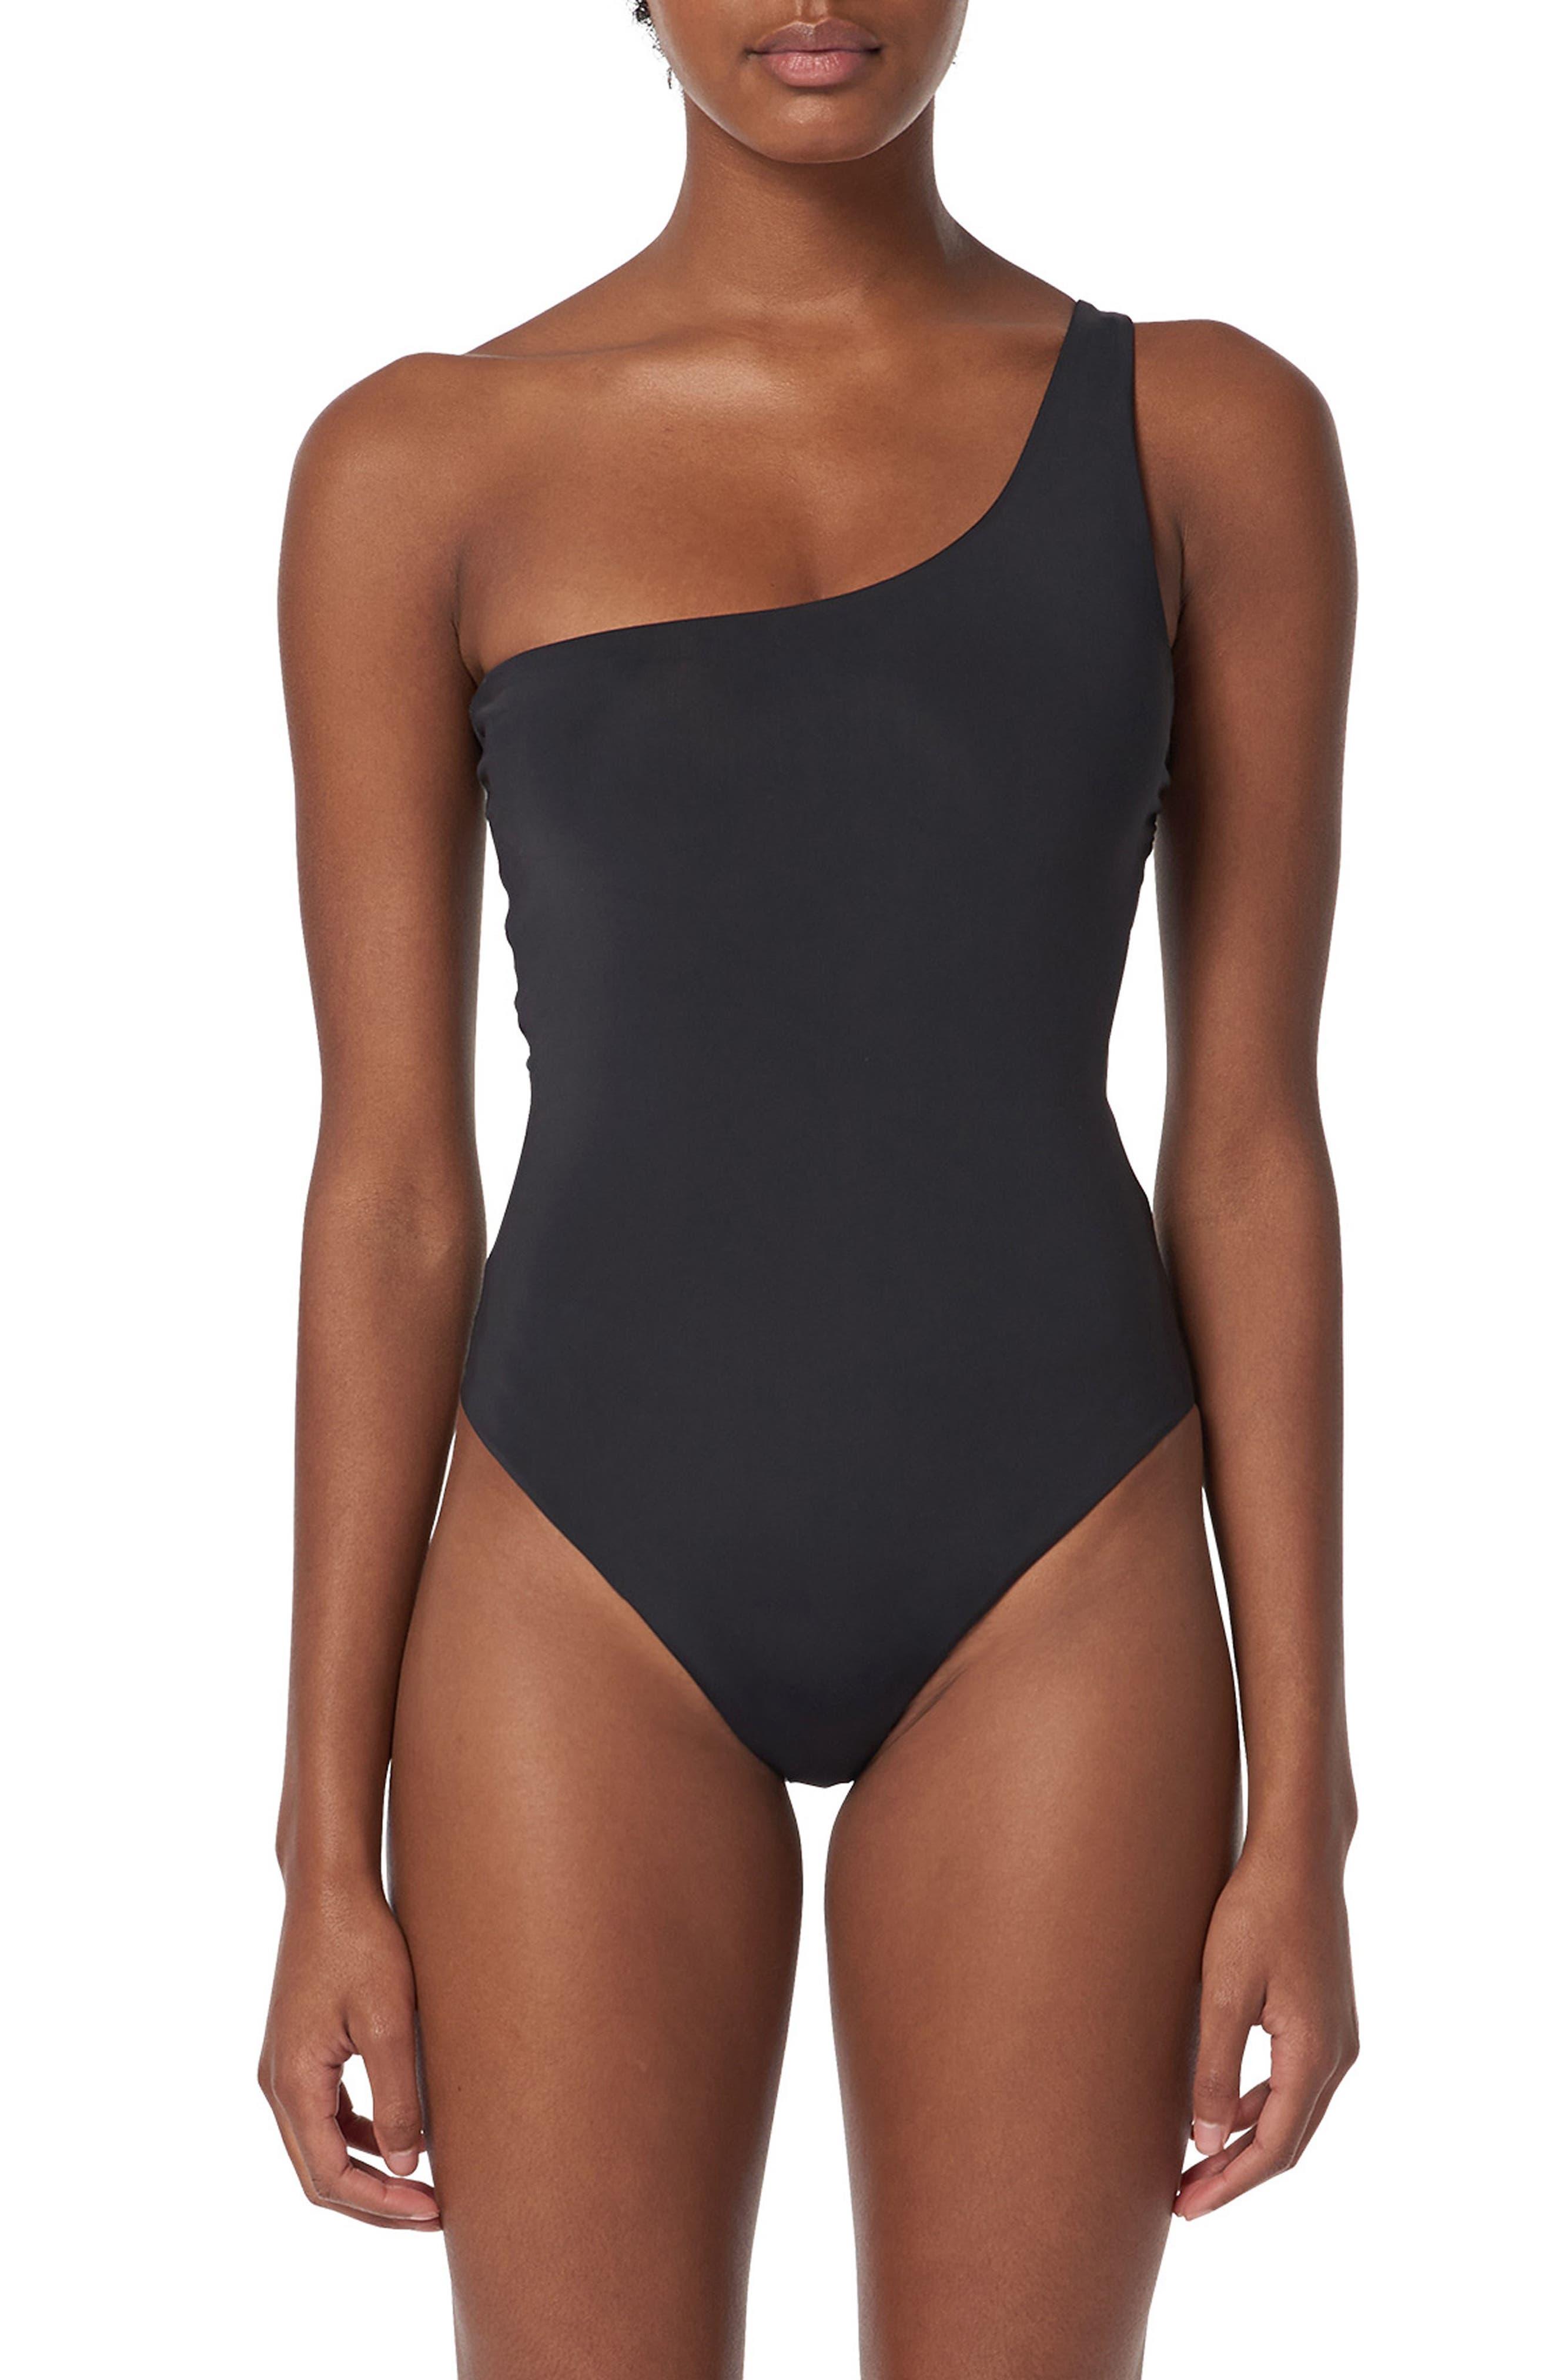 Cher One-Piece Swimsuit,                             Main thumbnail 1, color,                             Black